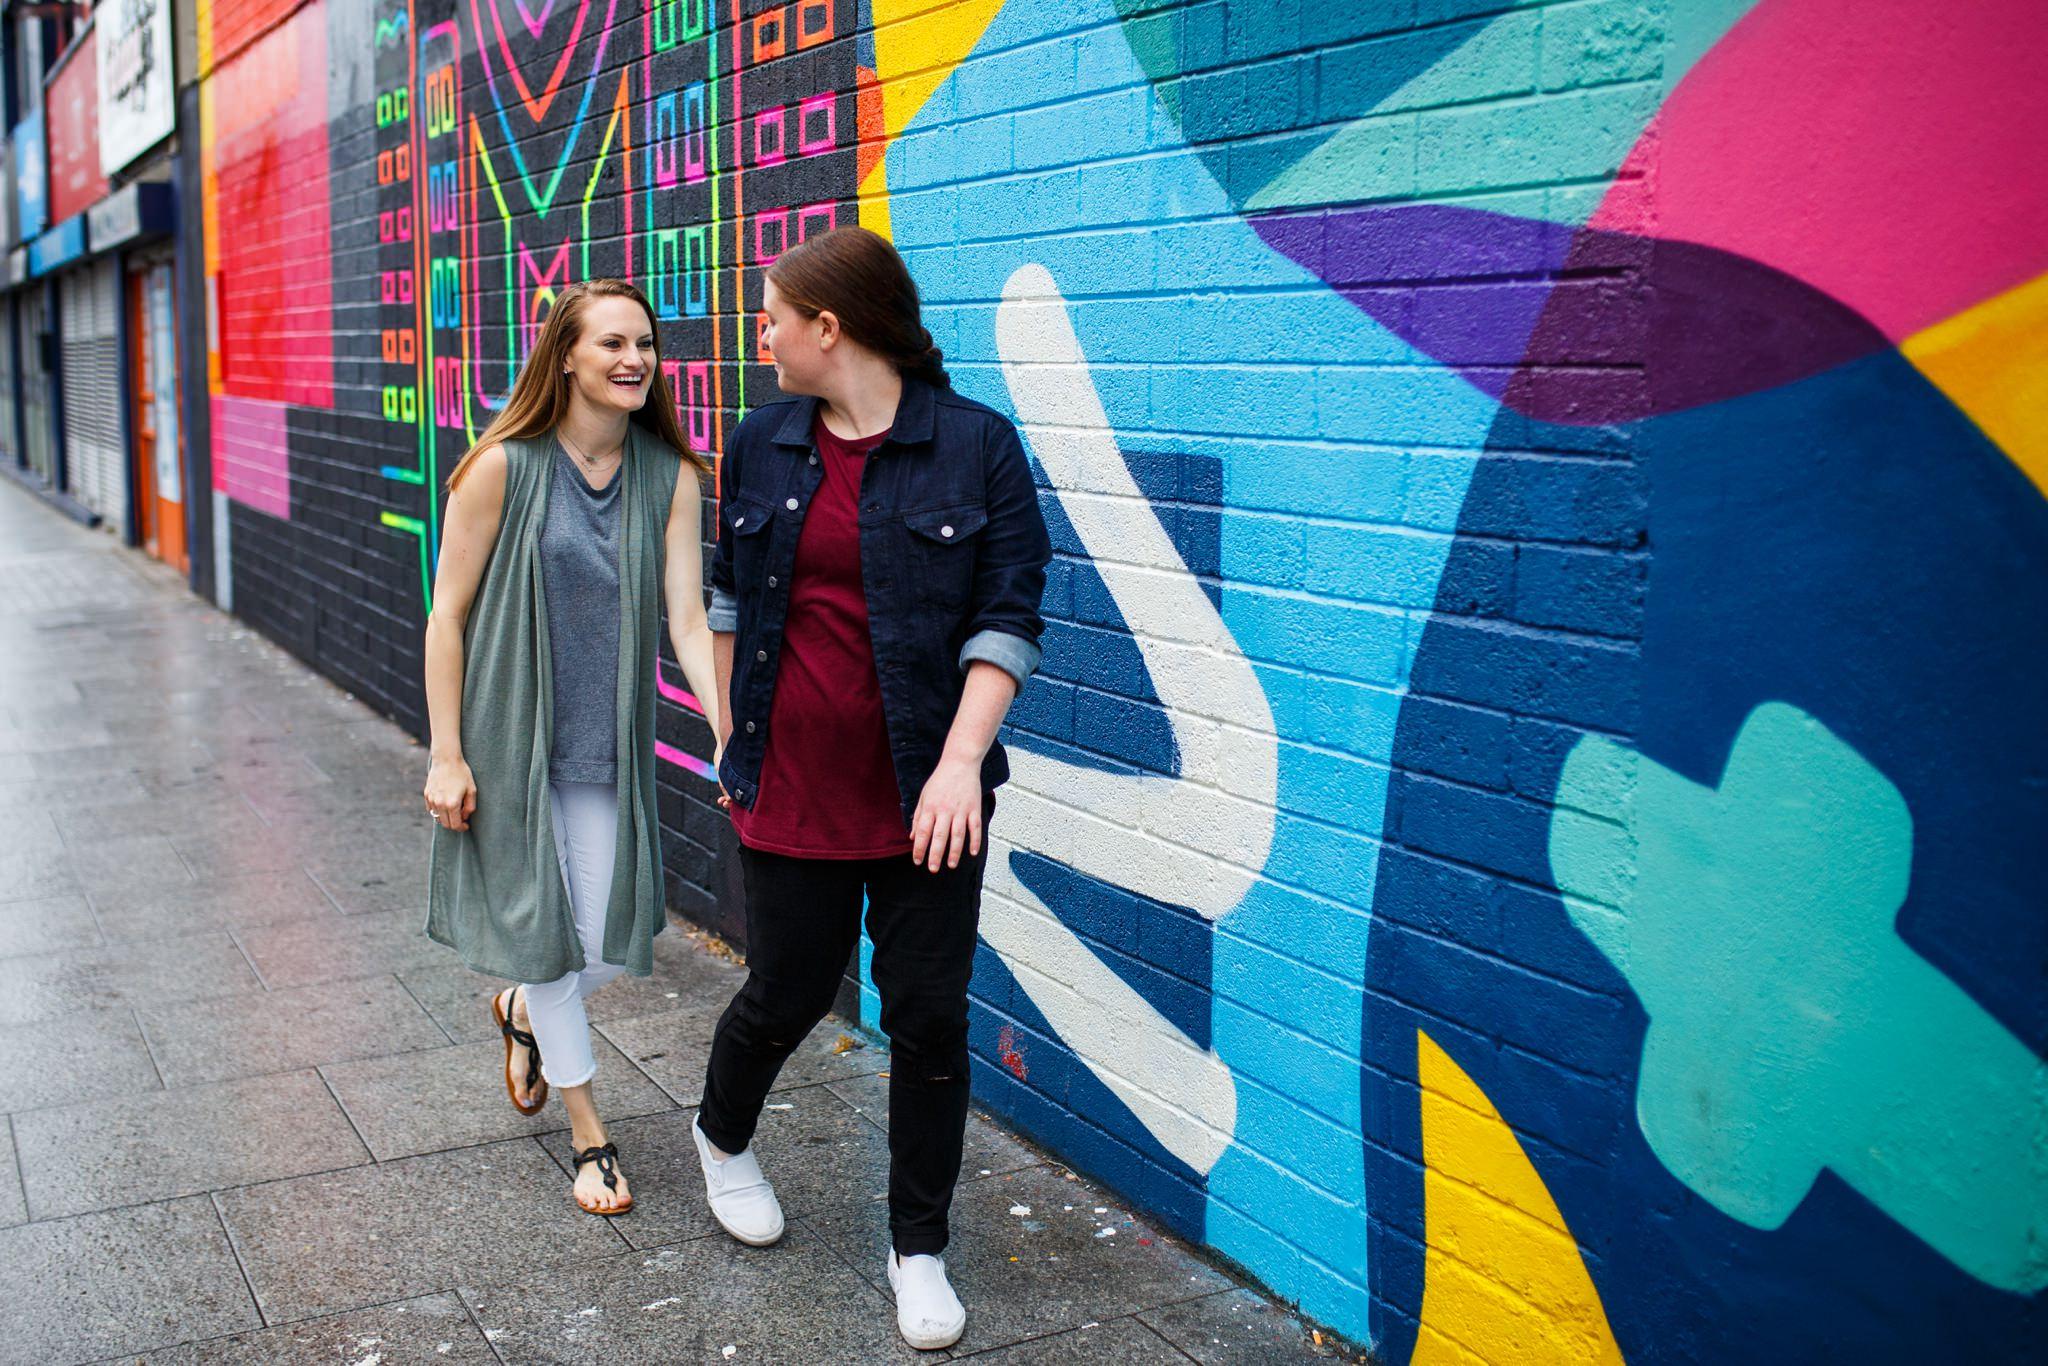 Elisha-Clarke-Photography-Dublin-City-Wedding_0007.jpg